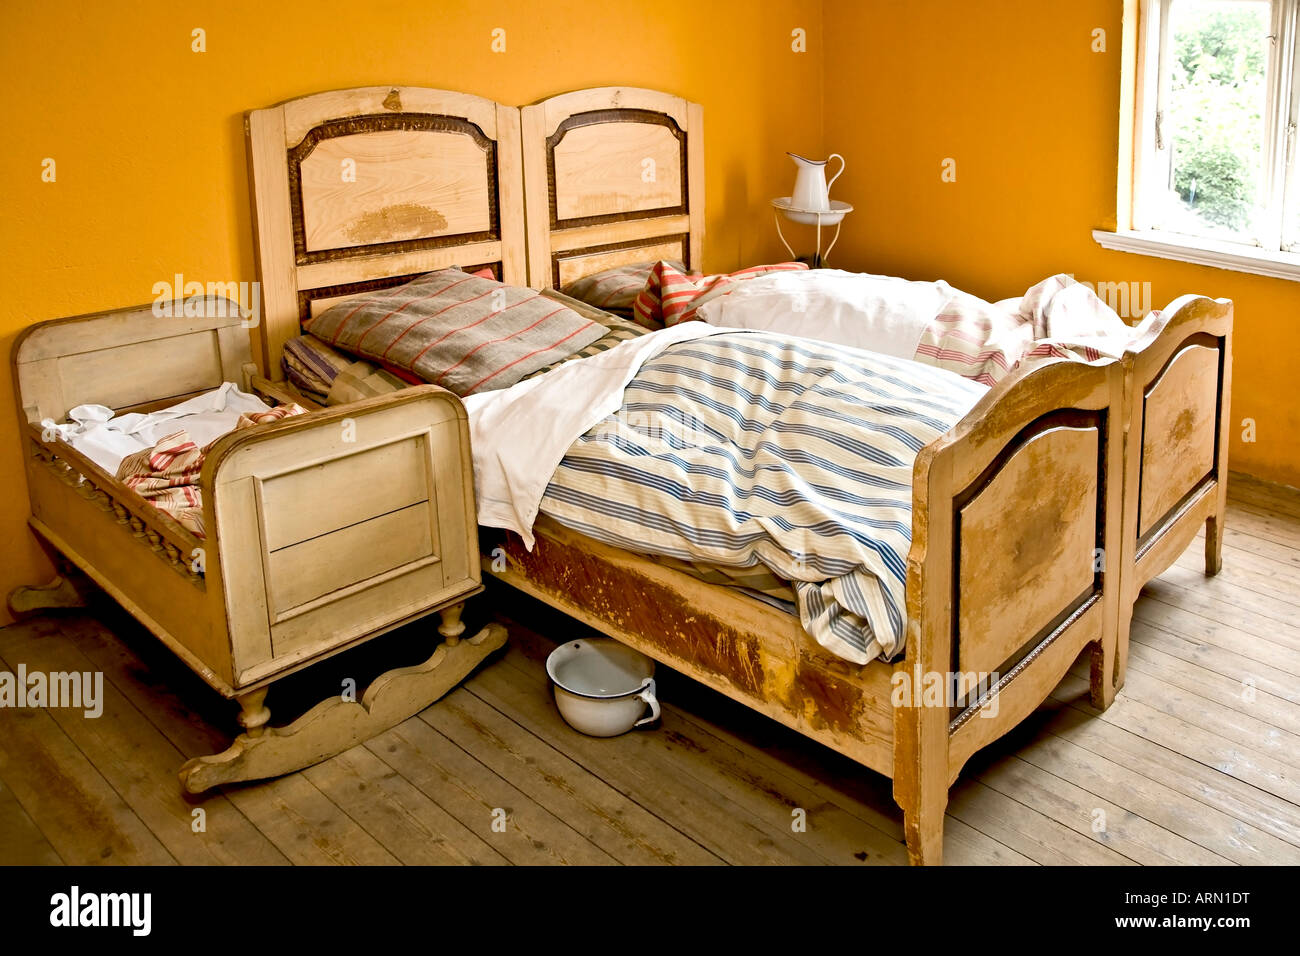 Altes Schlafzimmer Innenraum Stockfoto, Bild: 16091315 - Alamy